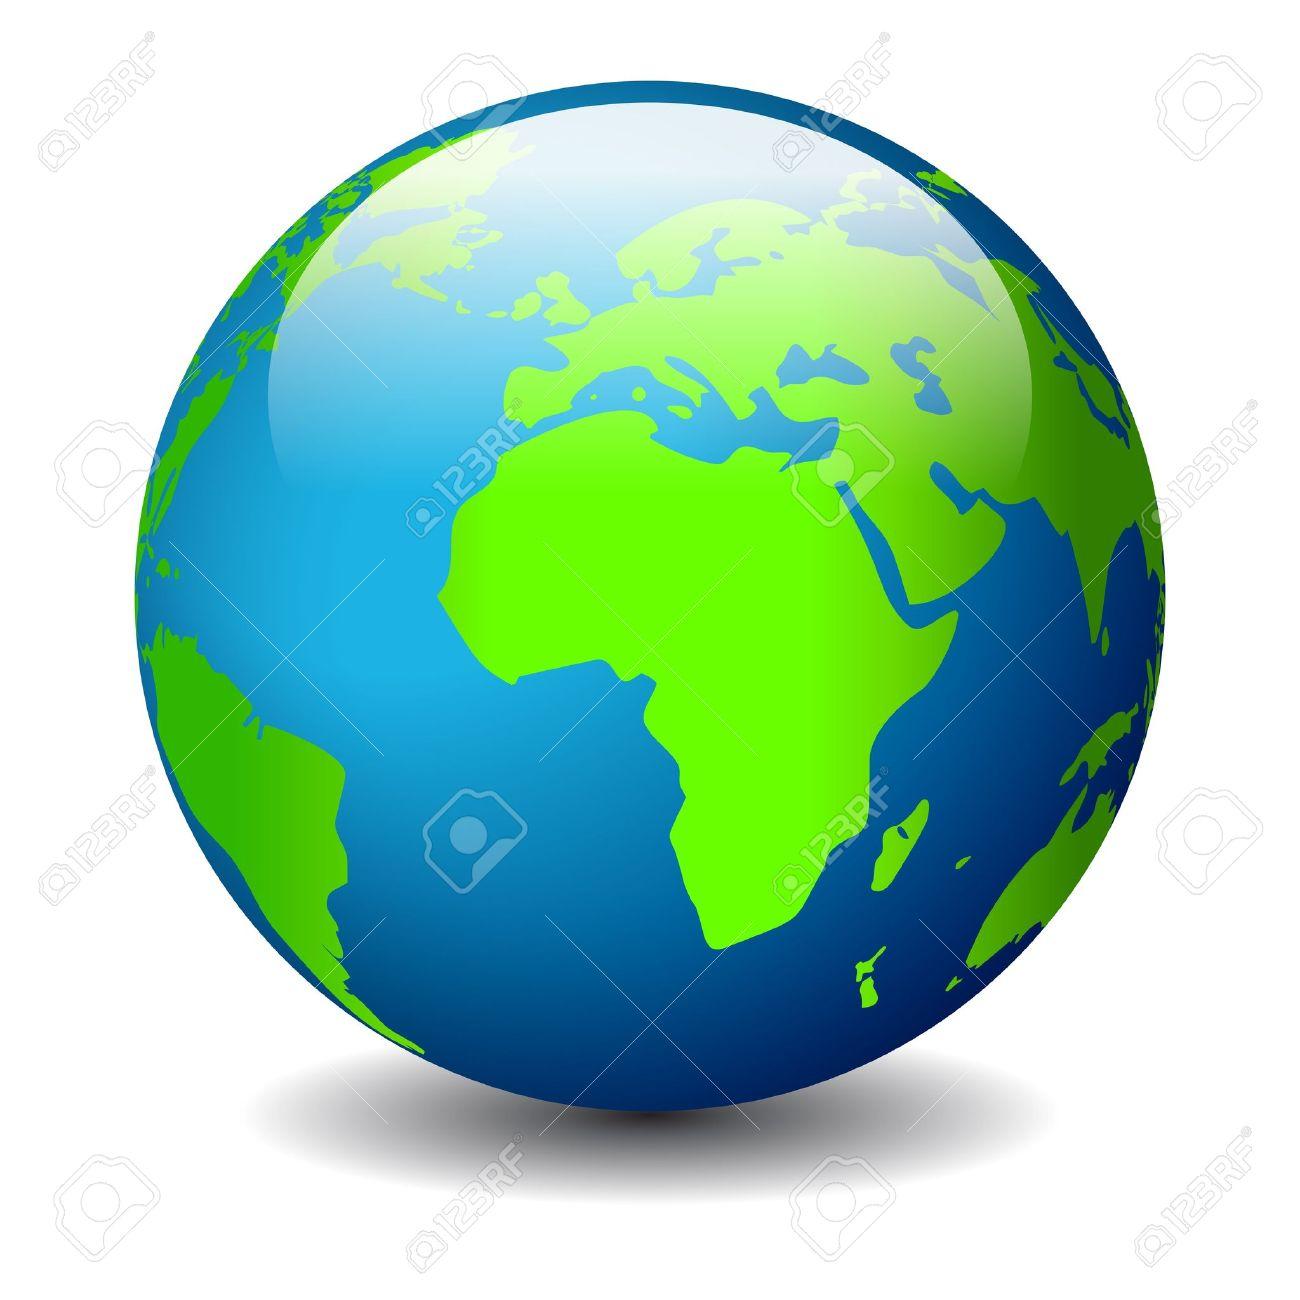 Globe icon, vector illustration Stock Vector - 15544266